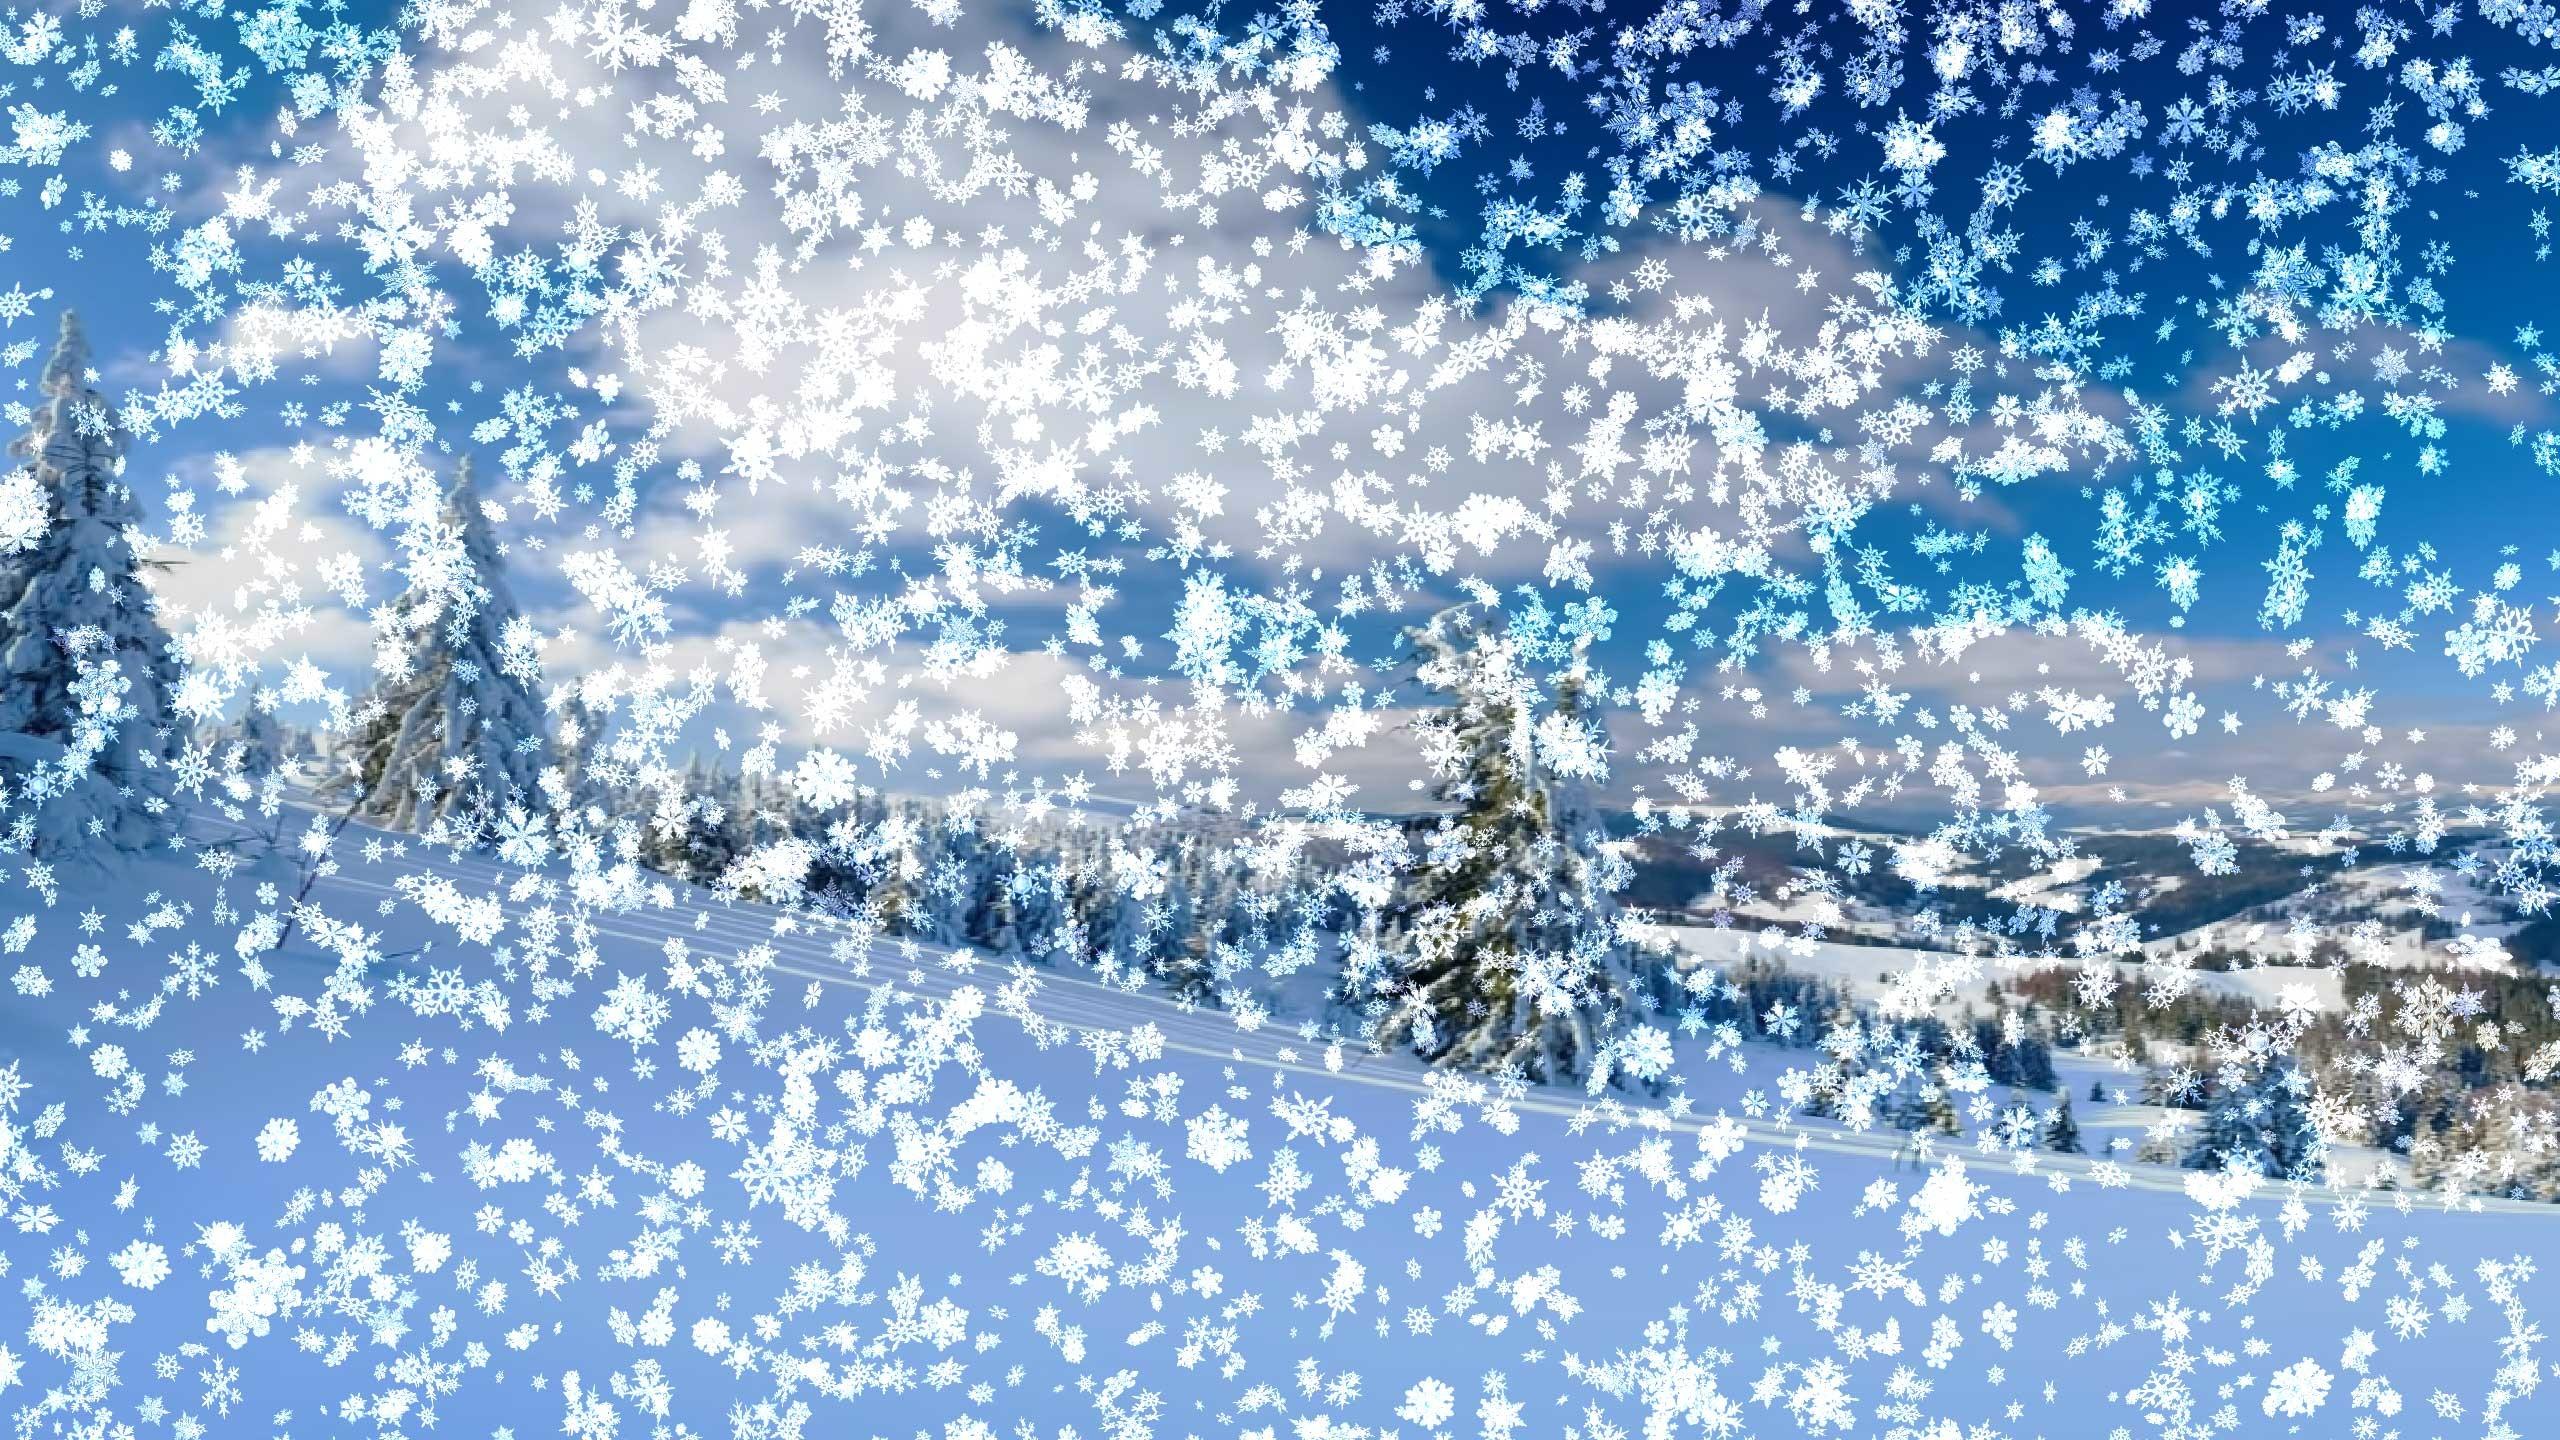 мерцающие картинки снегопад видео